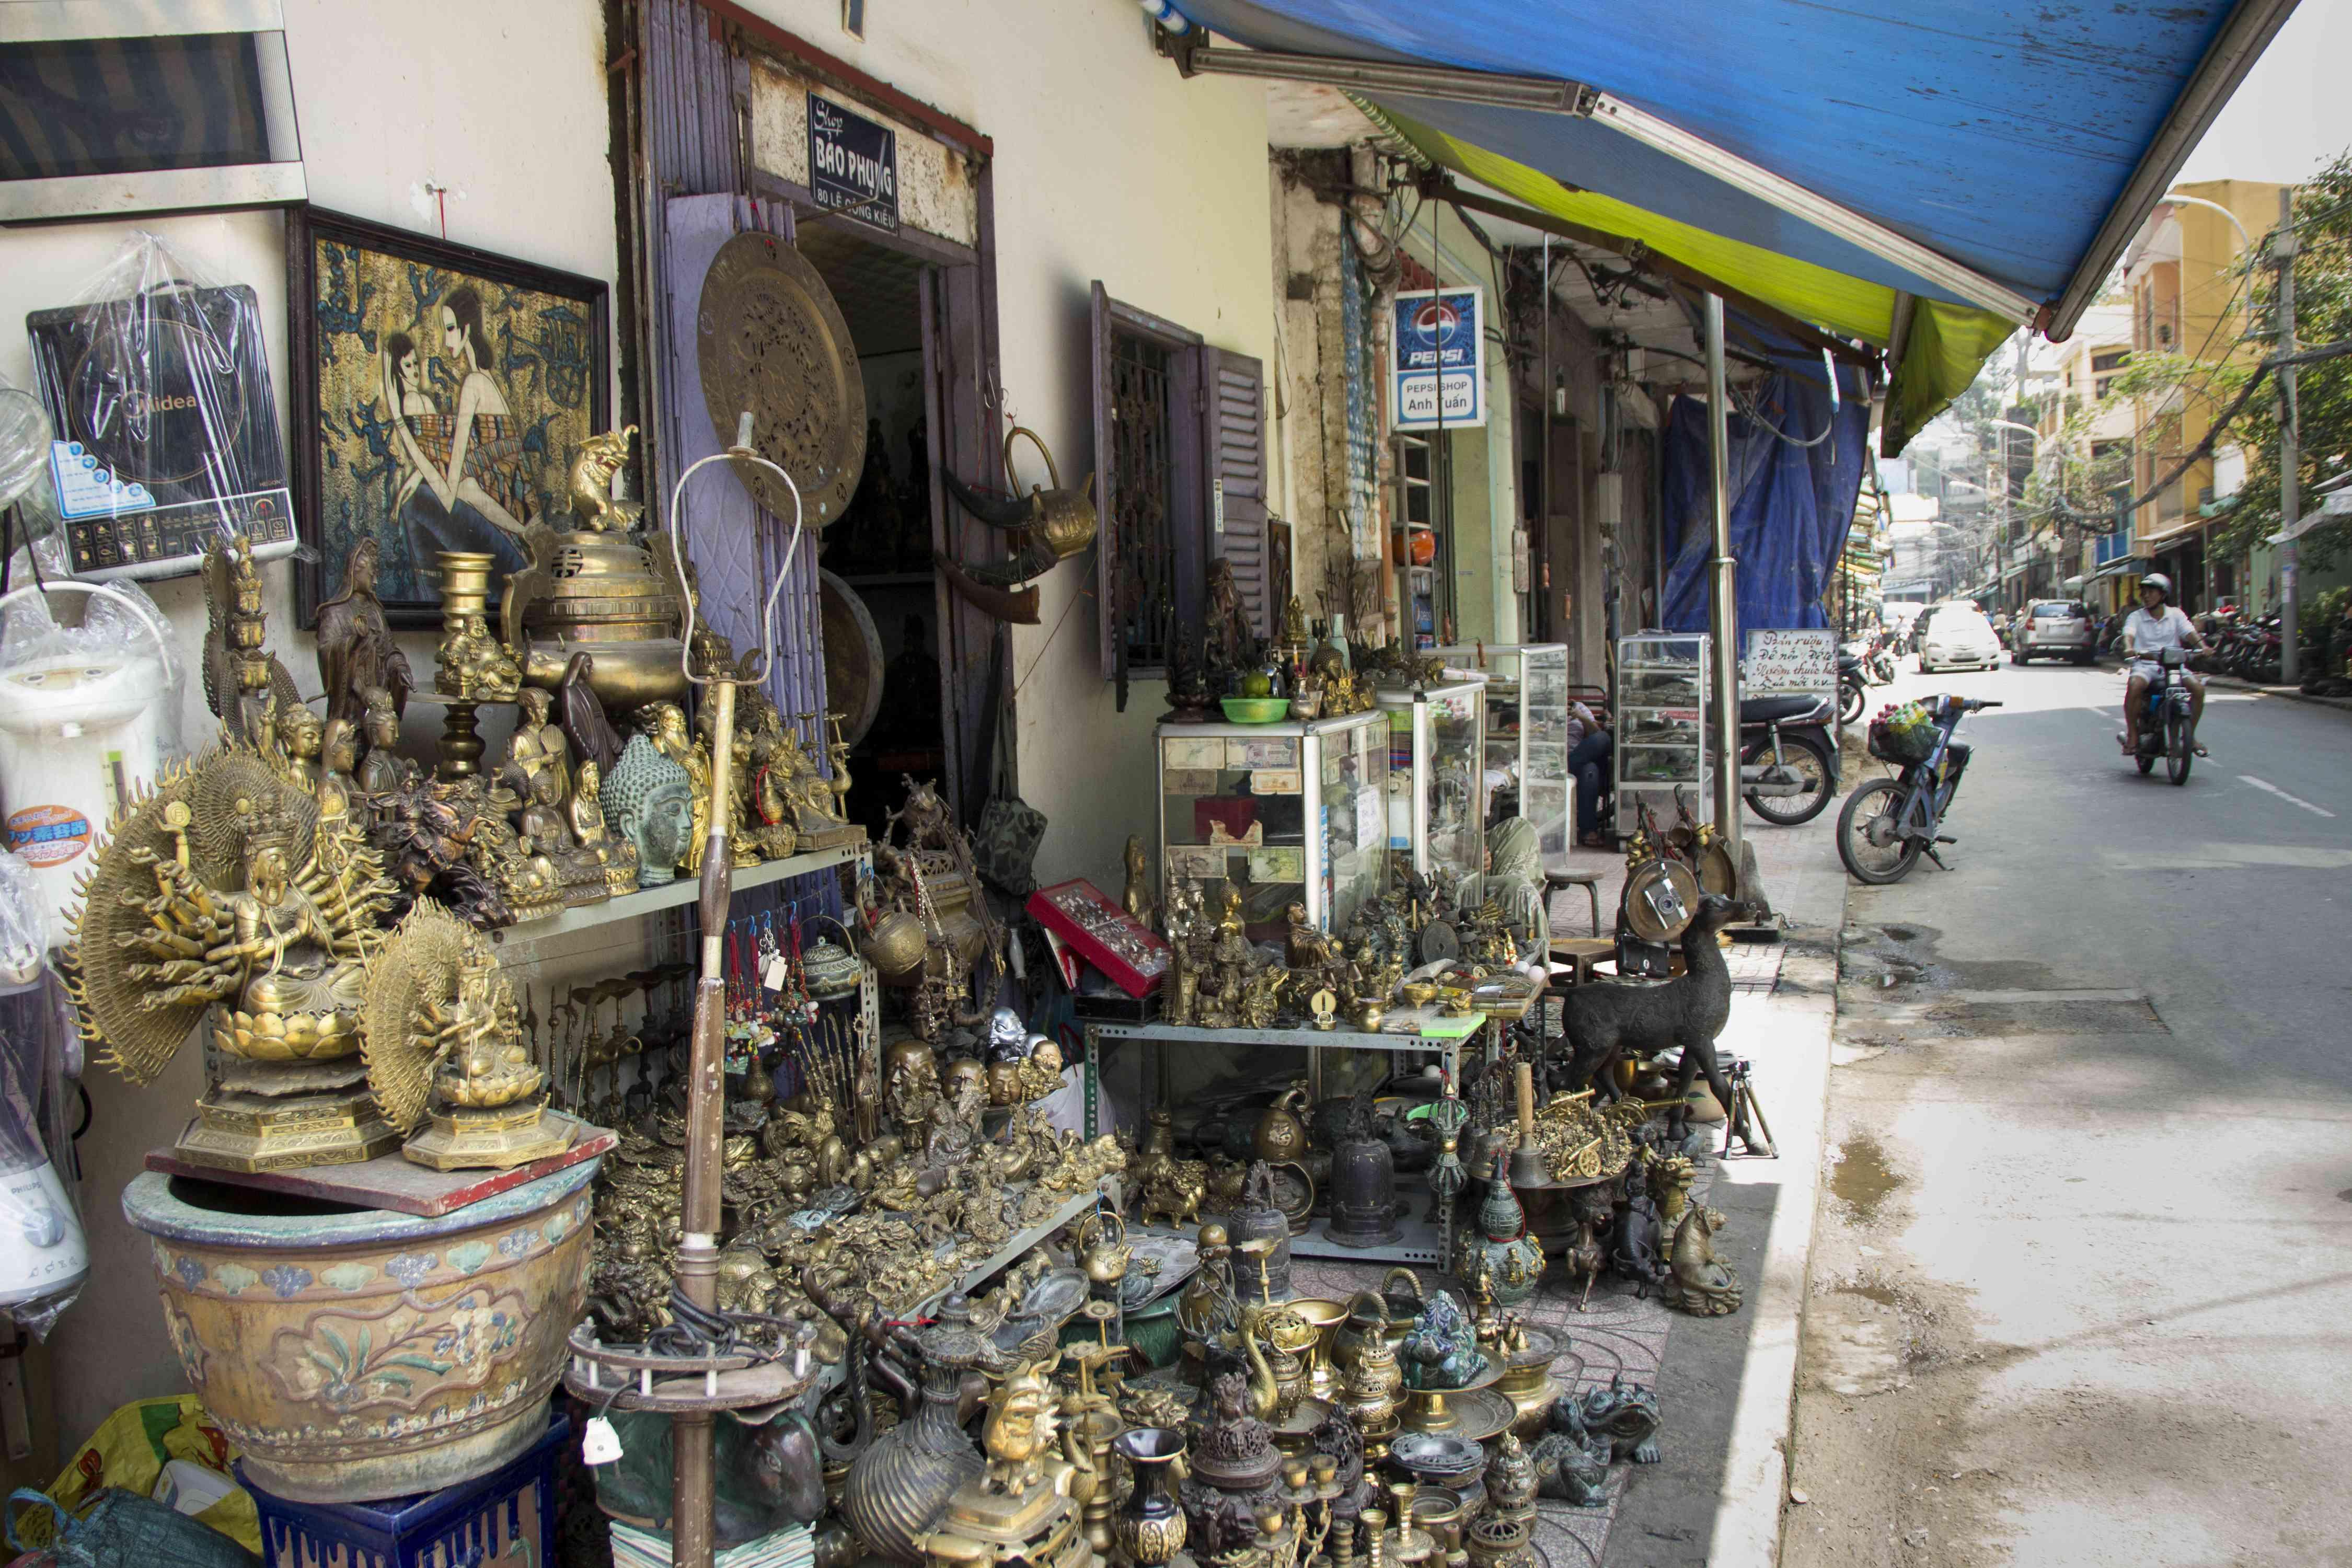 Antiques along Le Cong Kieu Street in Ho Chi Minh City